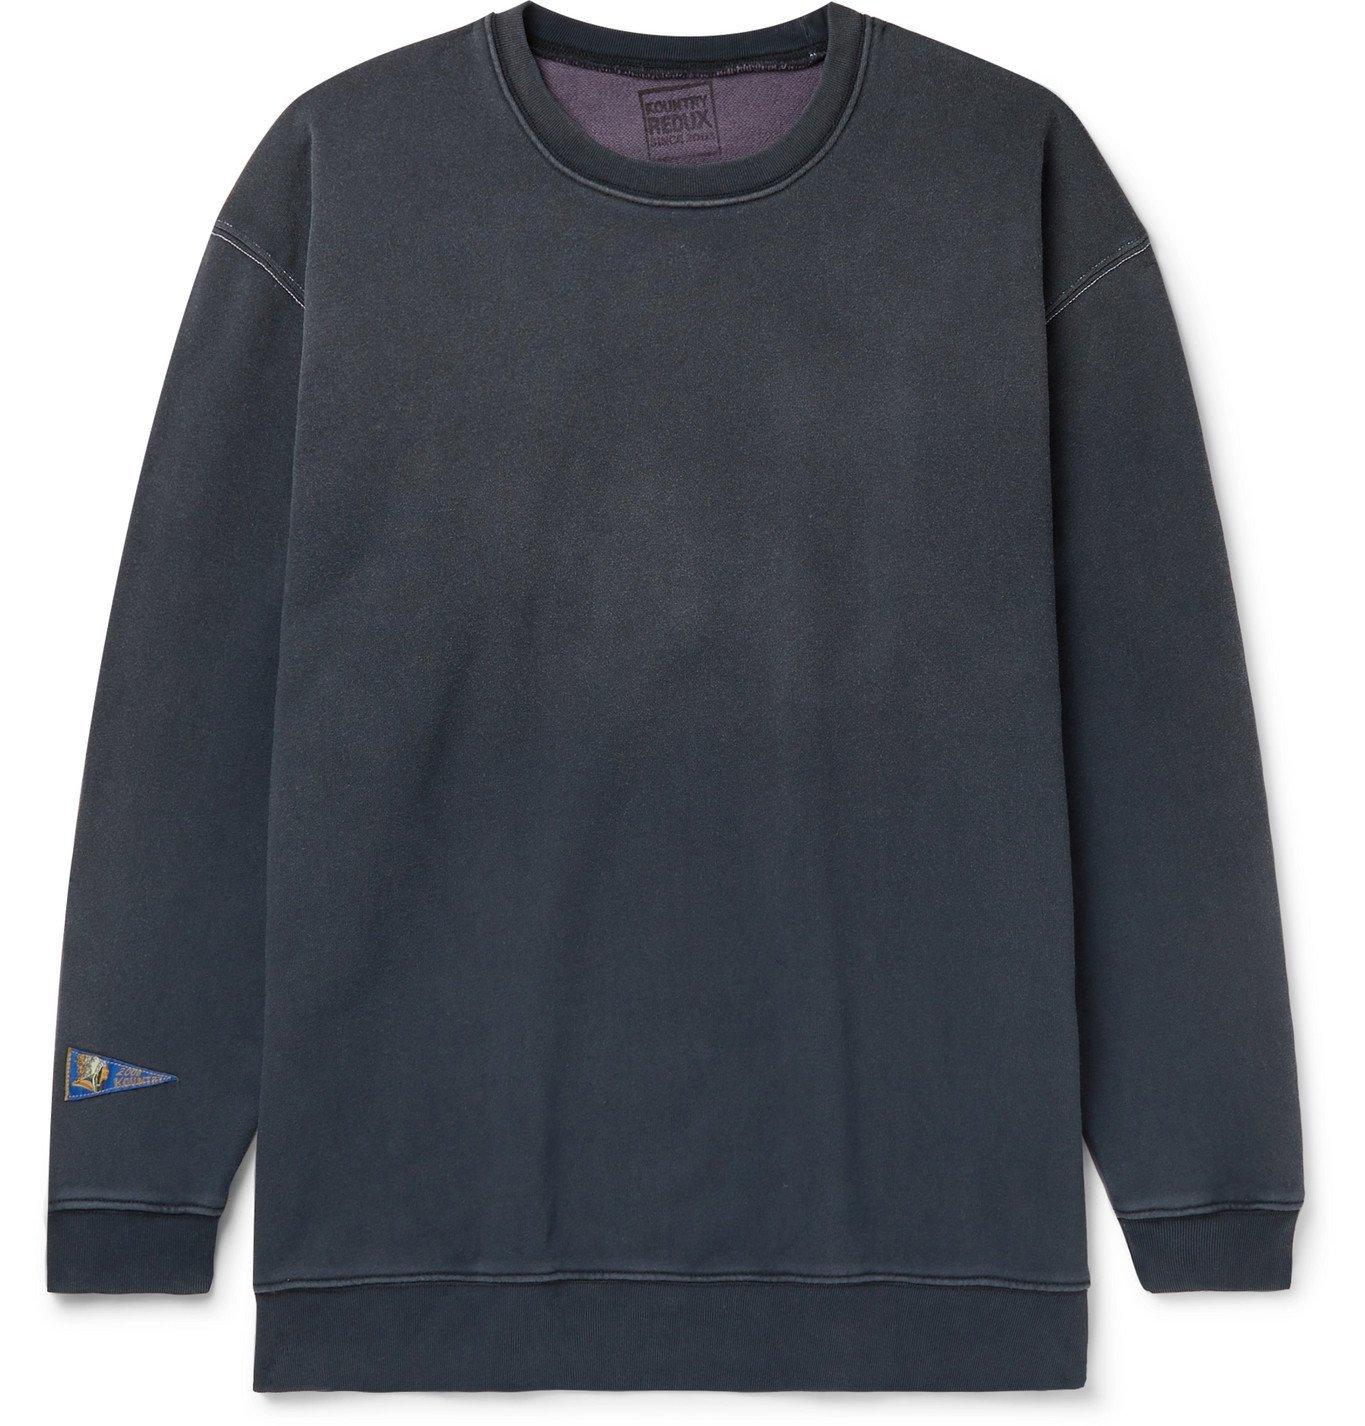 KAPITAL - Printed Loopback Cotton-Jersey Sweatshirt - Black